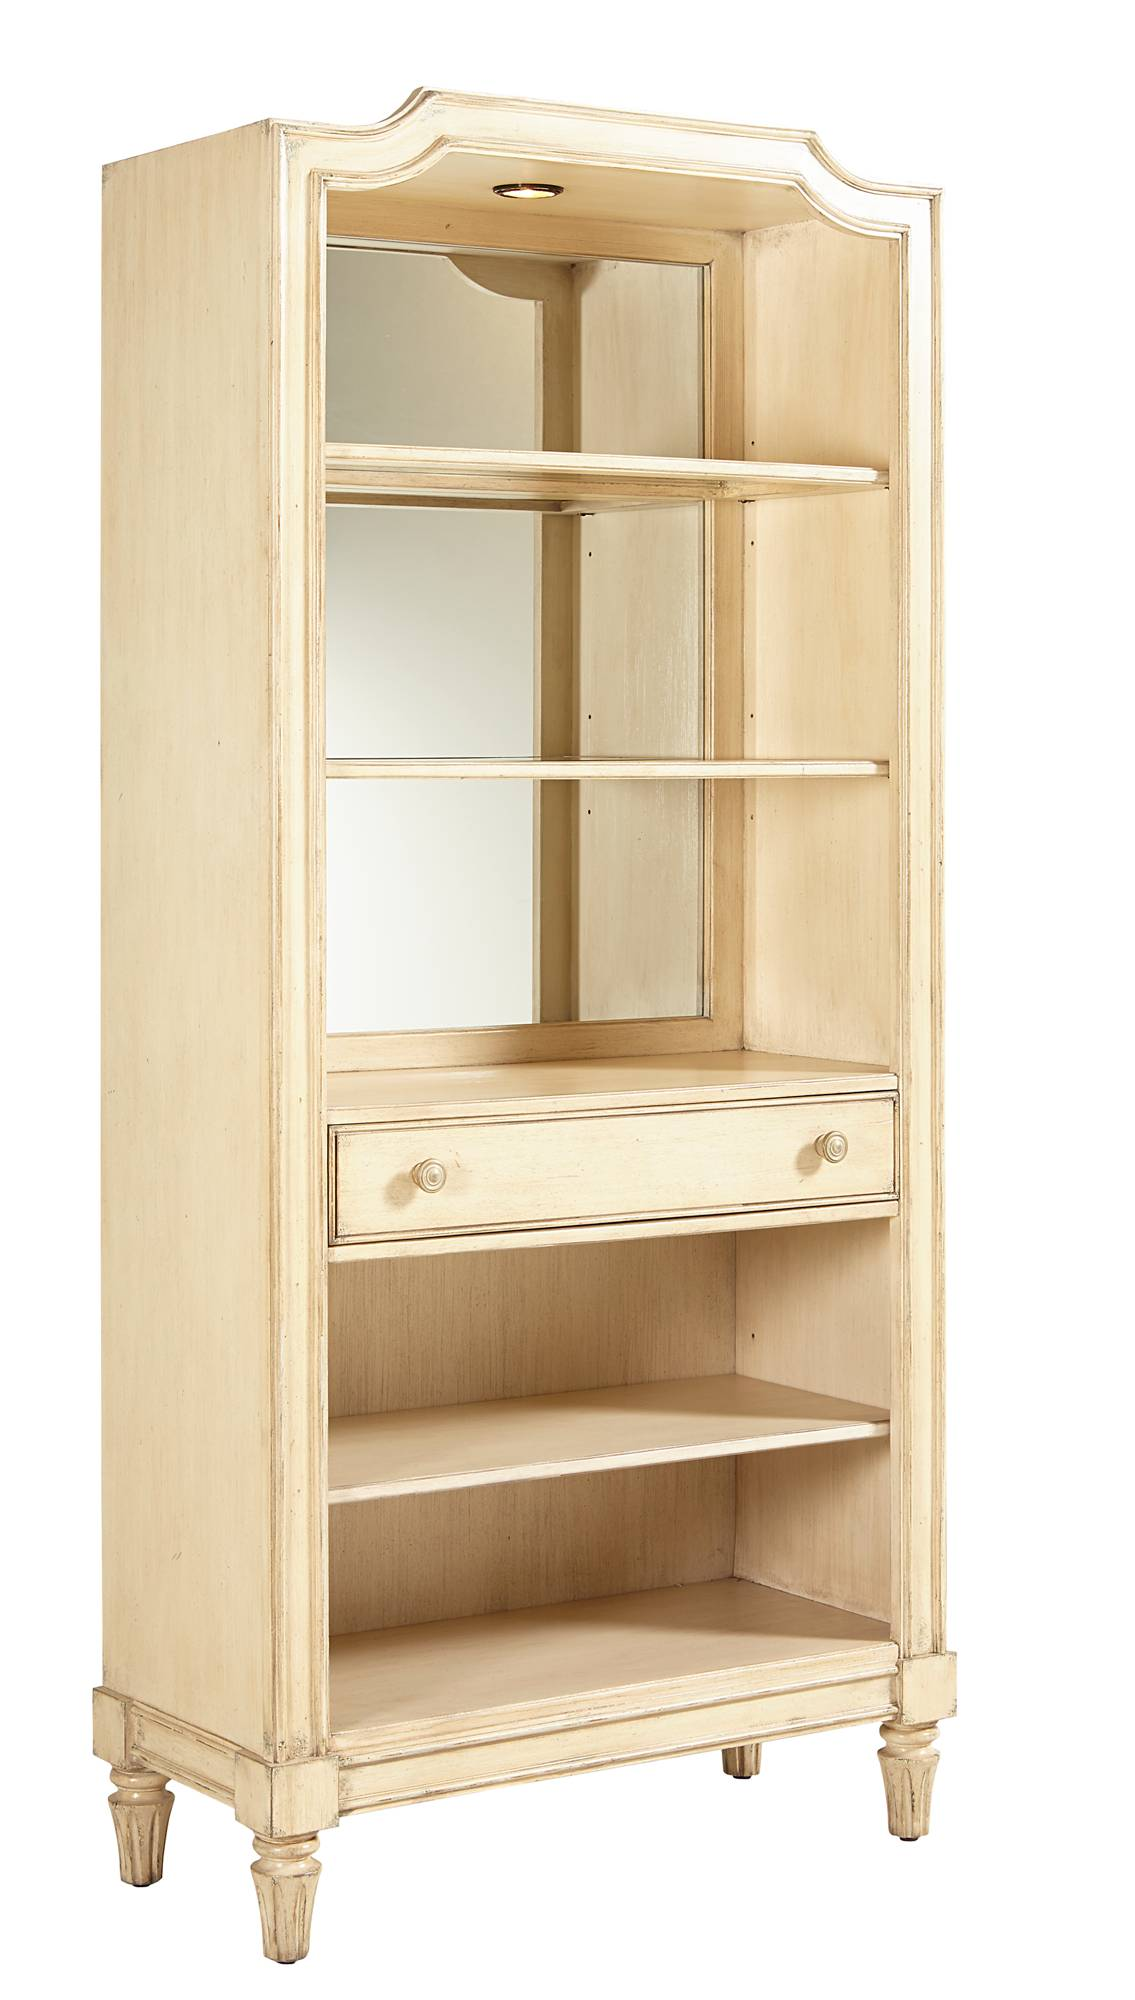 Stanley Furniture European Cottage Bookcase - Item Number: 007-25-18